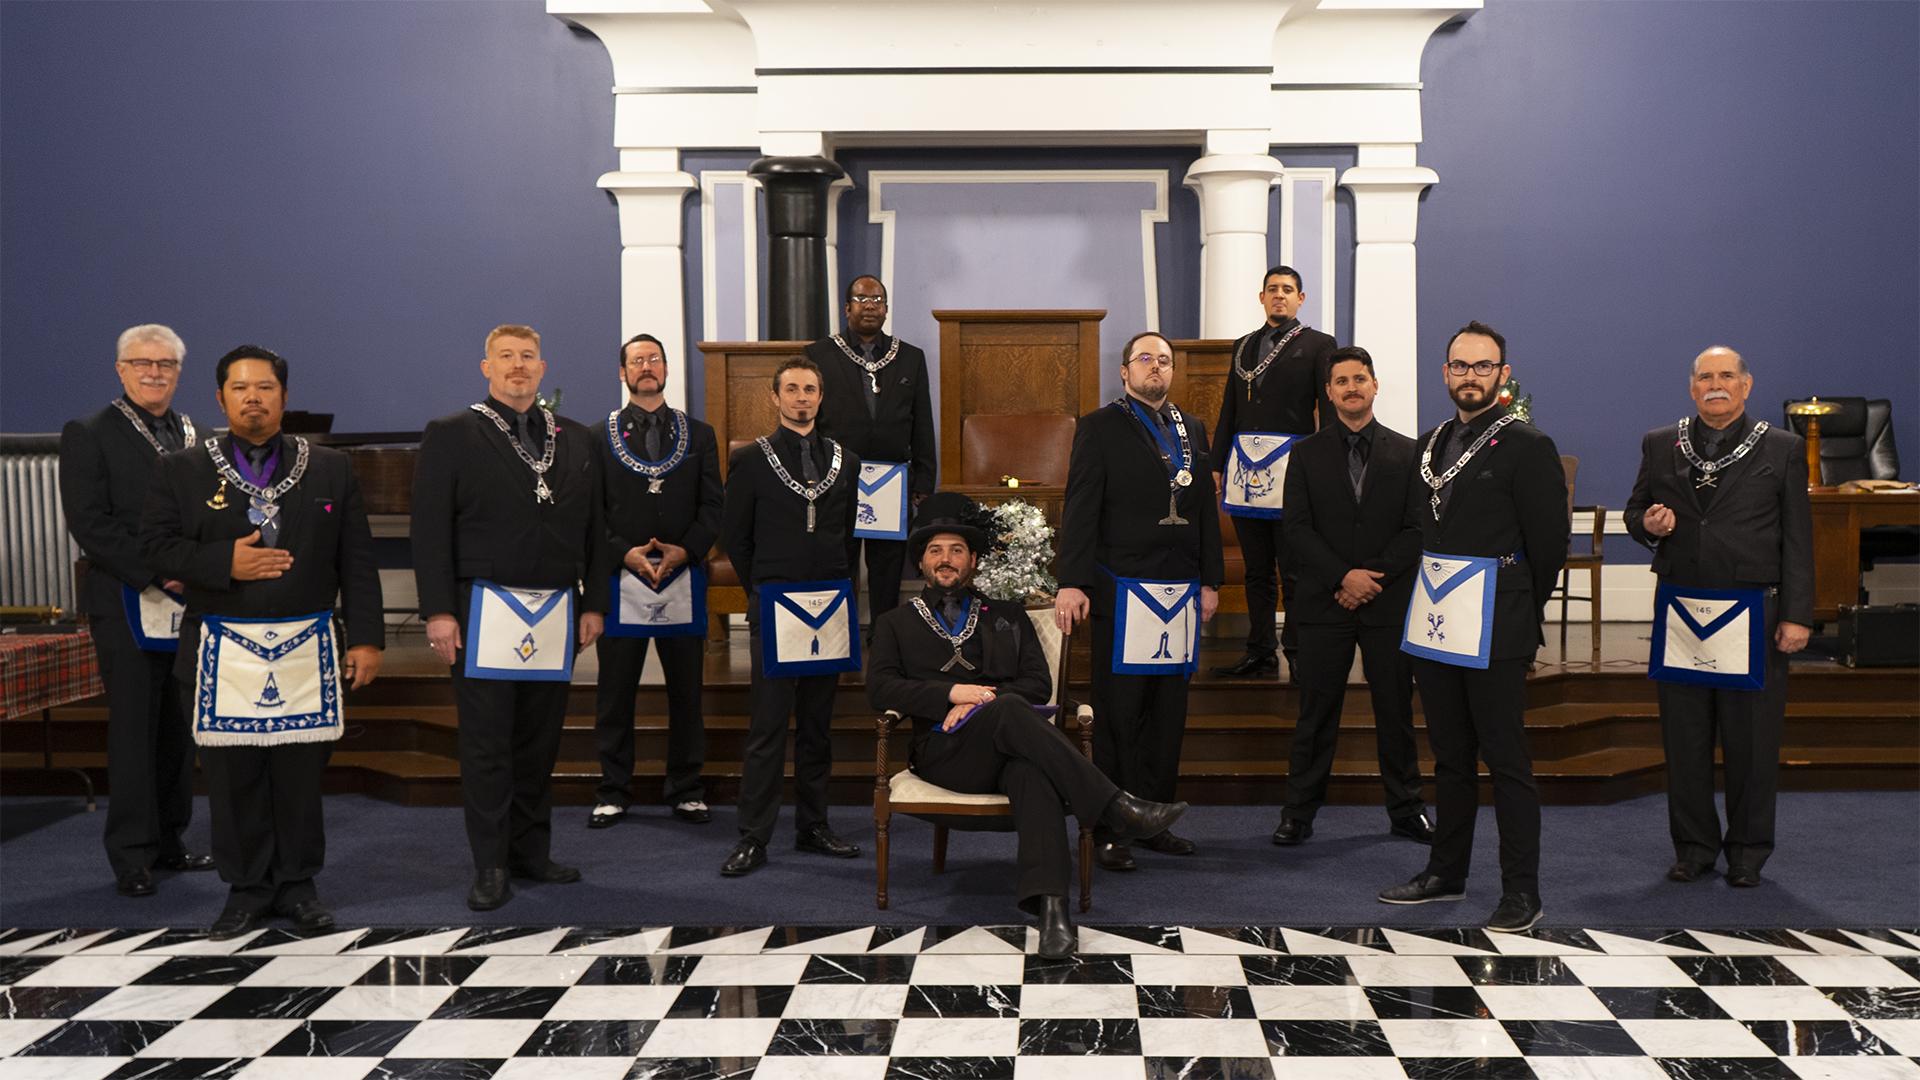 installation 2019 - officers